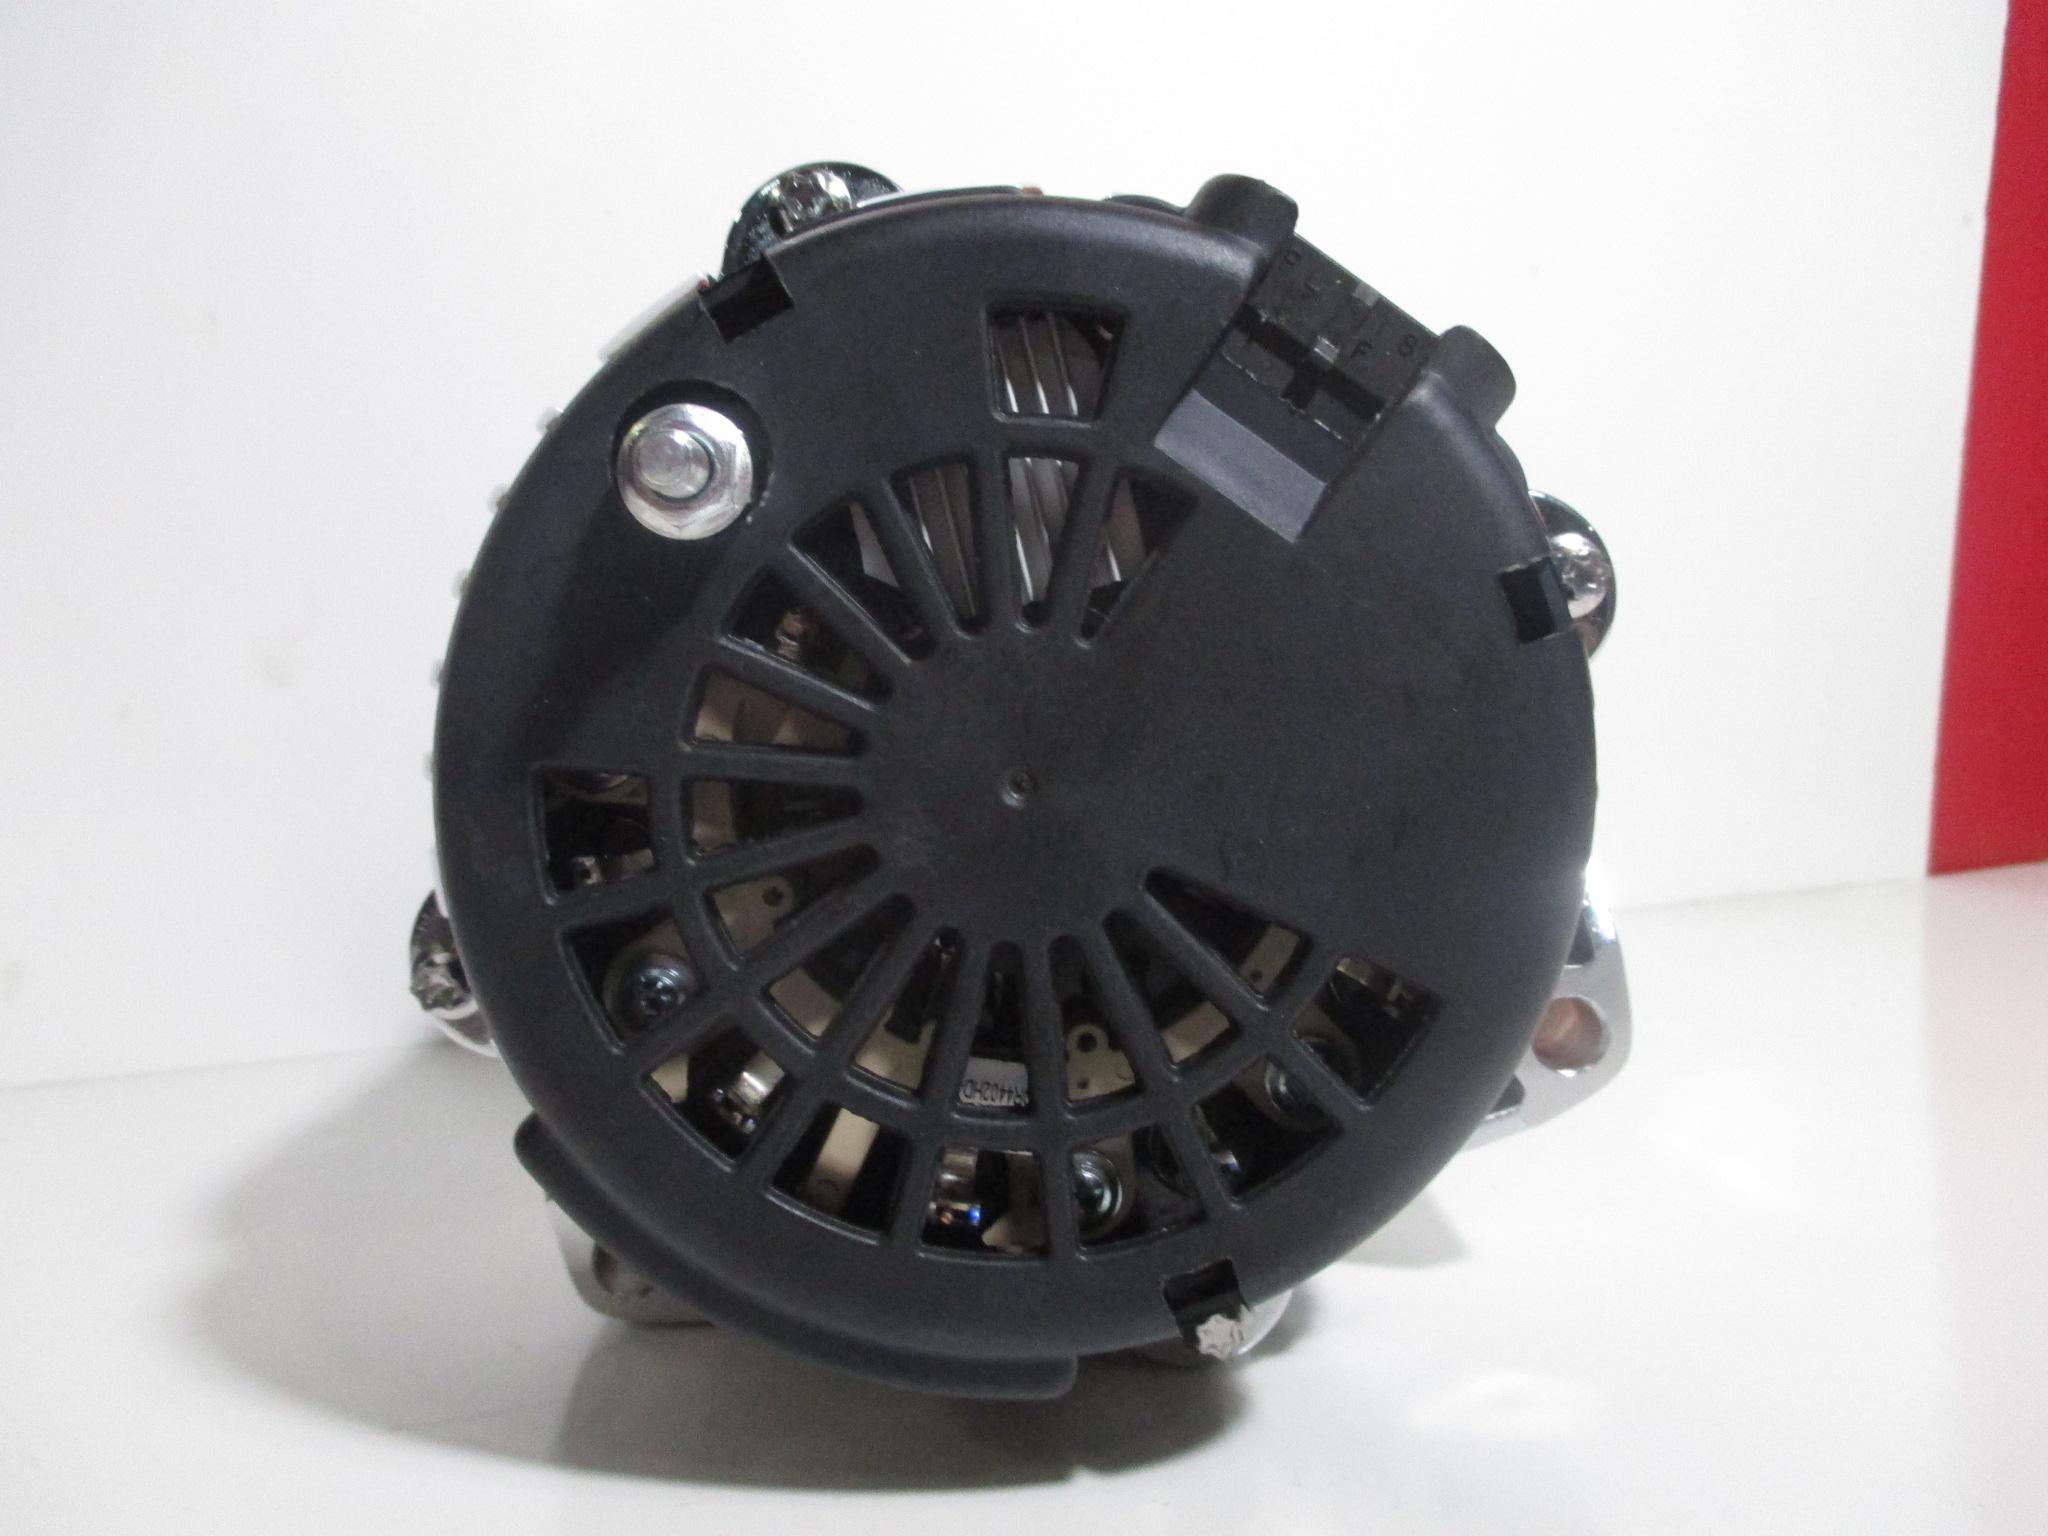 How To Make The Ls1 Alternator 1 Wirealternatorwiringjpg